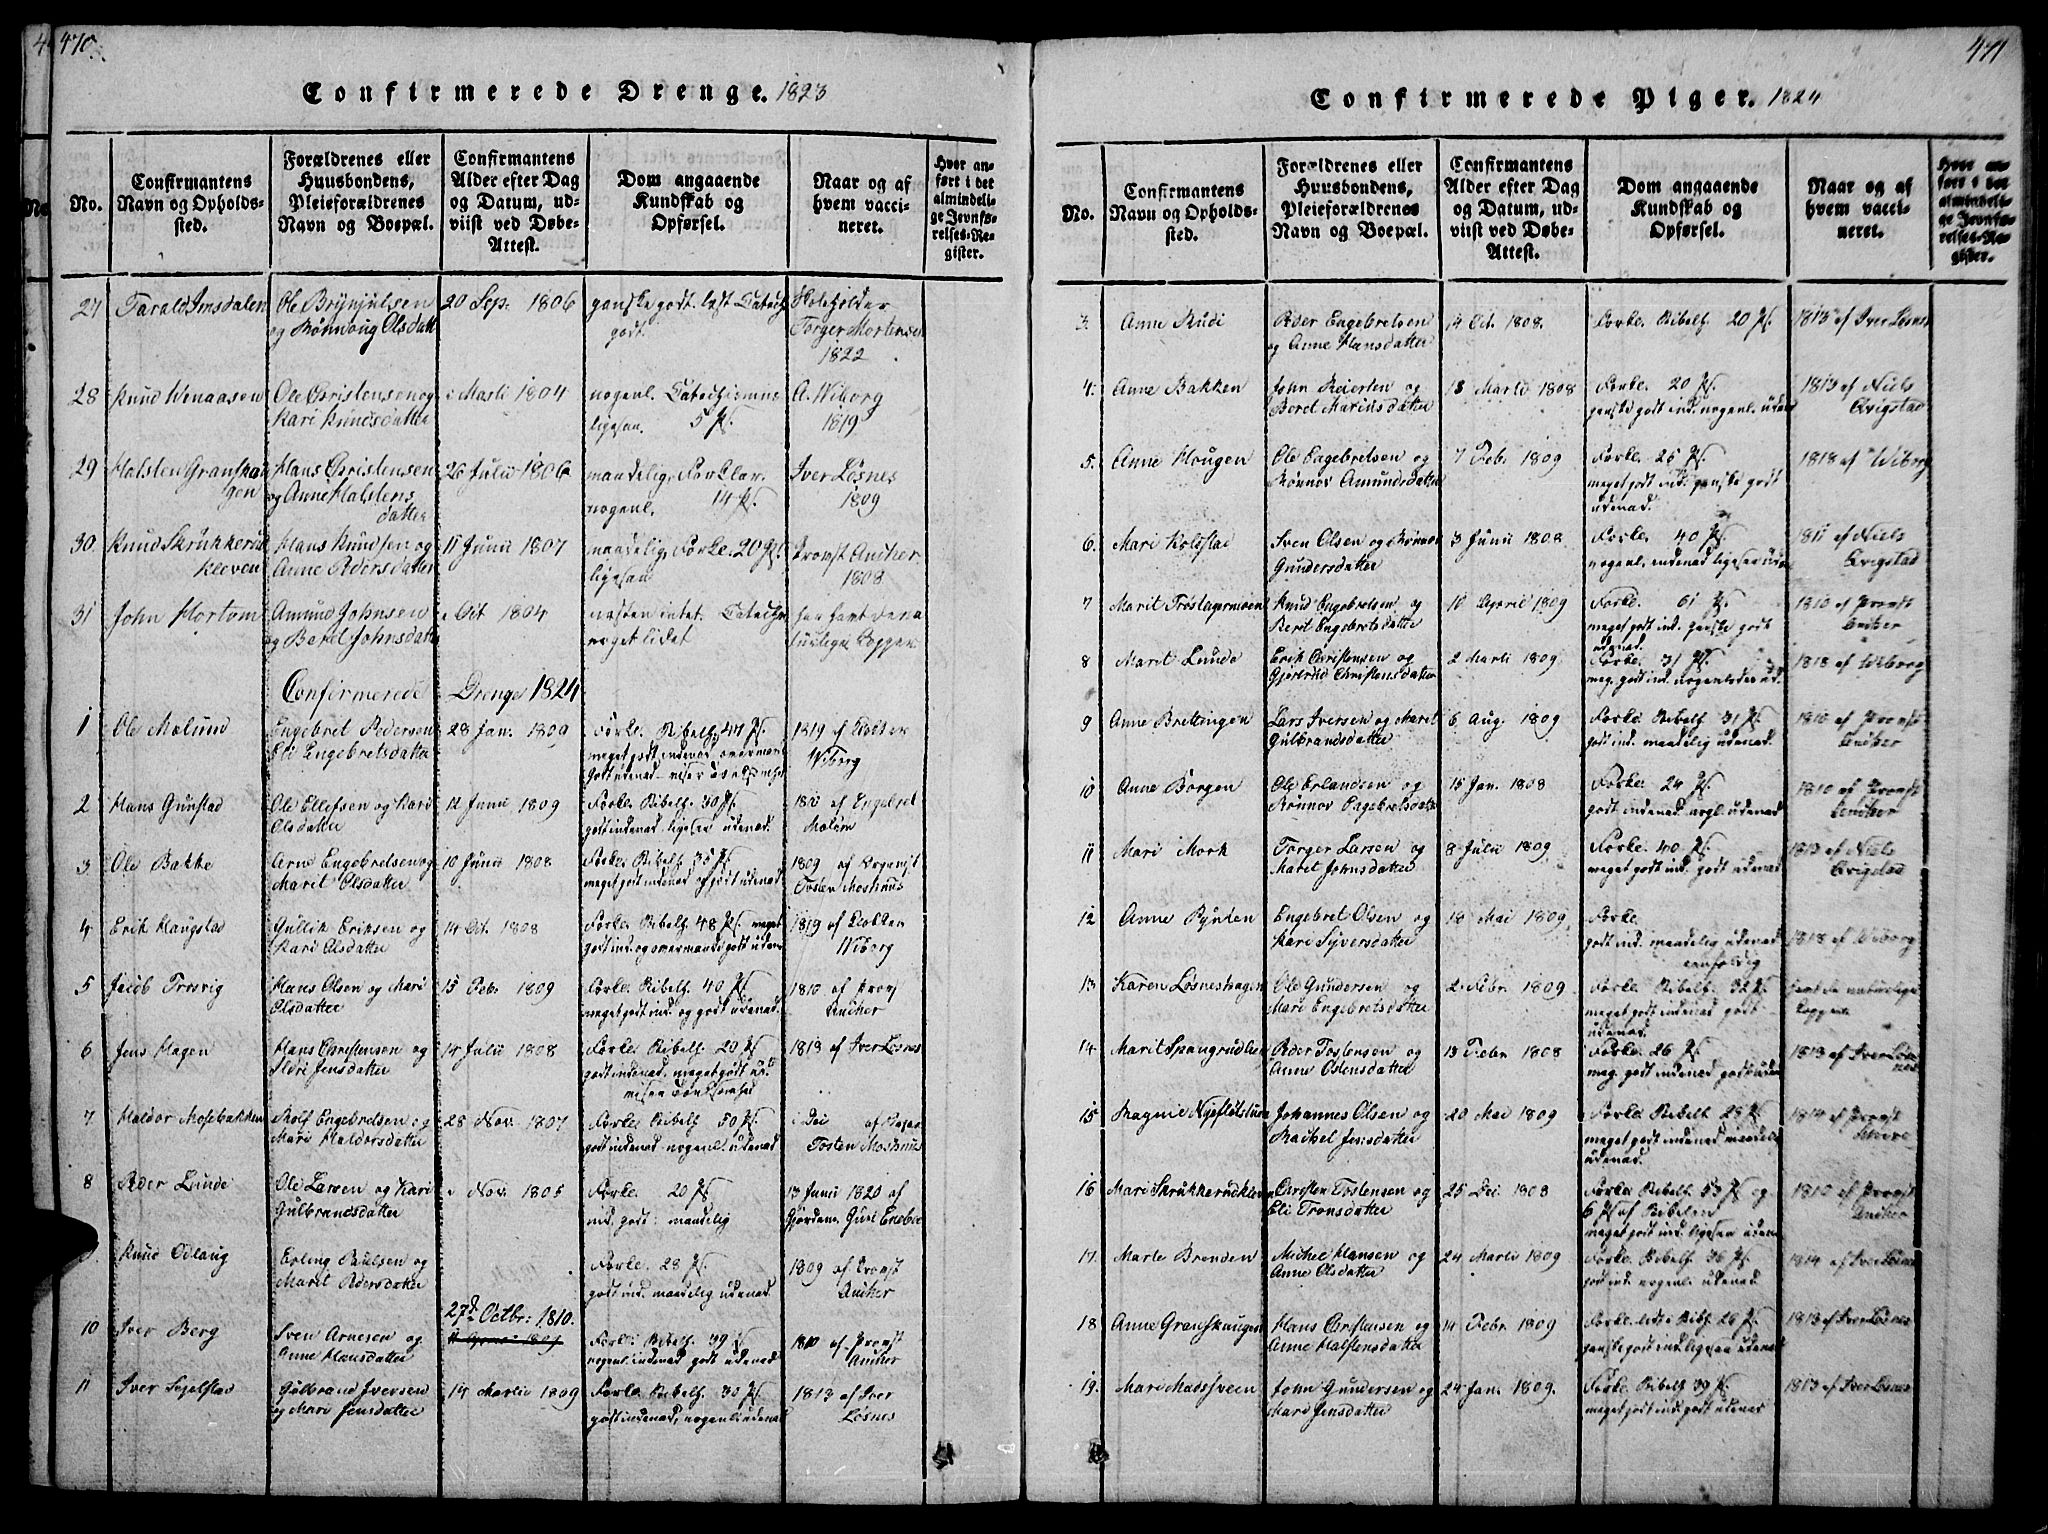 SAH, Ringebu prestekontor, Ministerialbok nr. 4, 1821-1839, s. 470-471